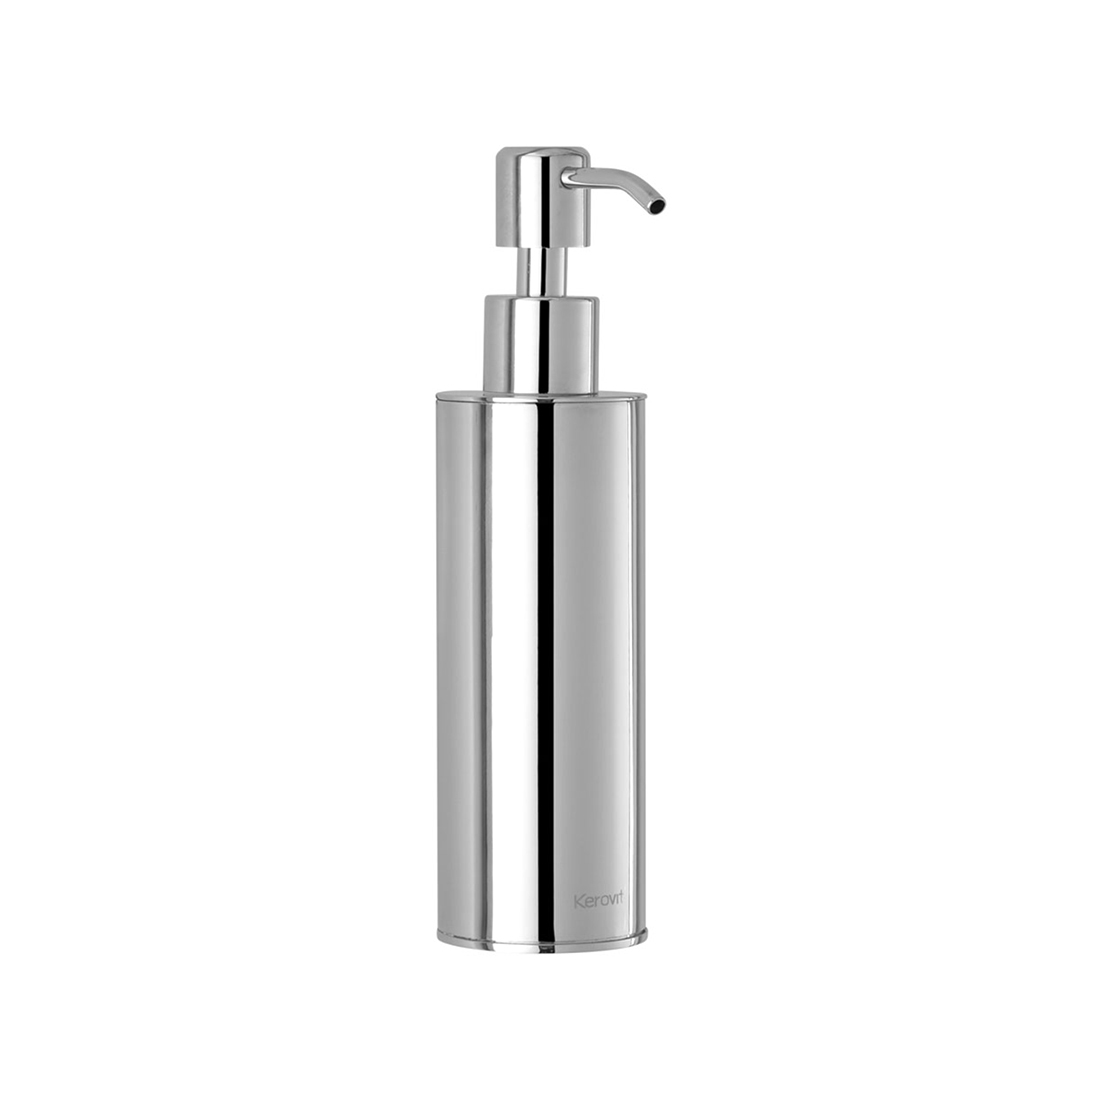 Kerovit KA930009 Round Range Soap Dispenser